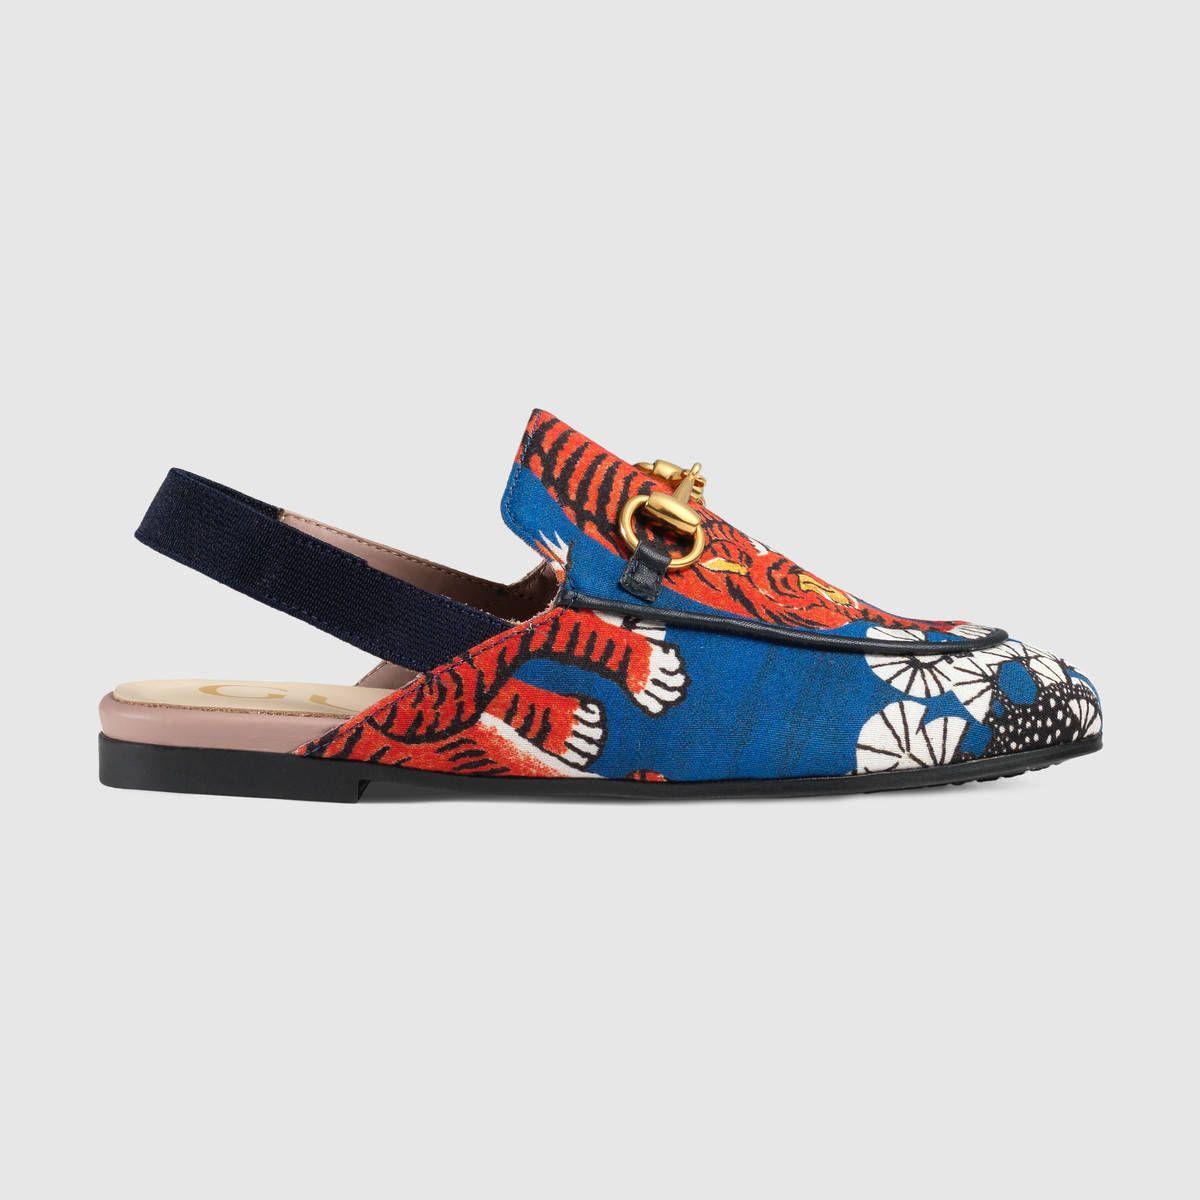 princetown gucci bengal slipper